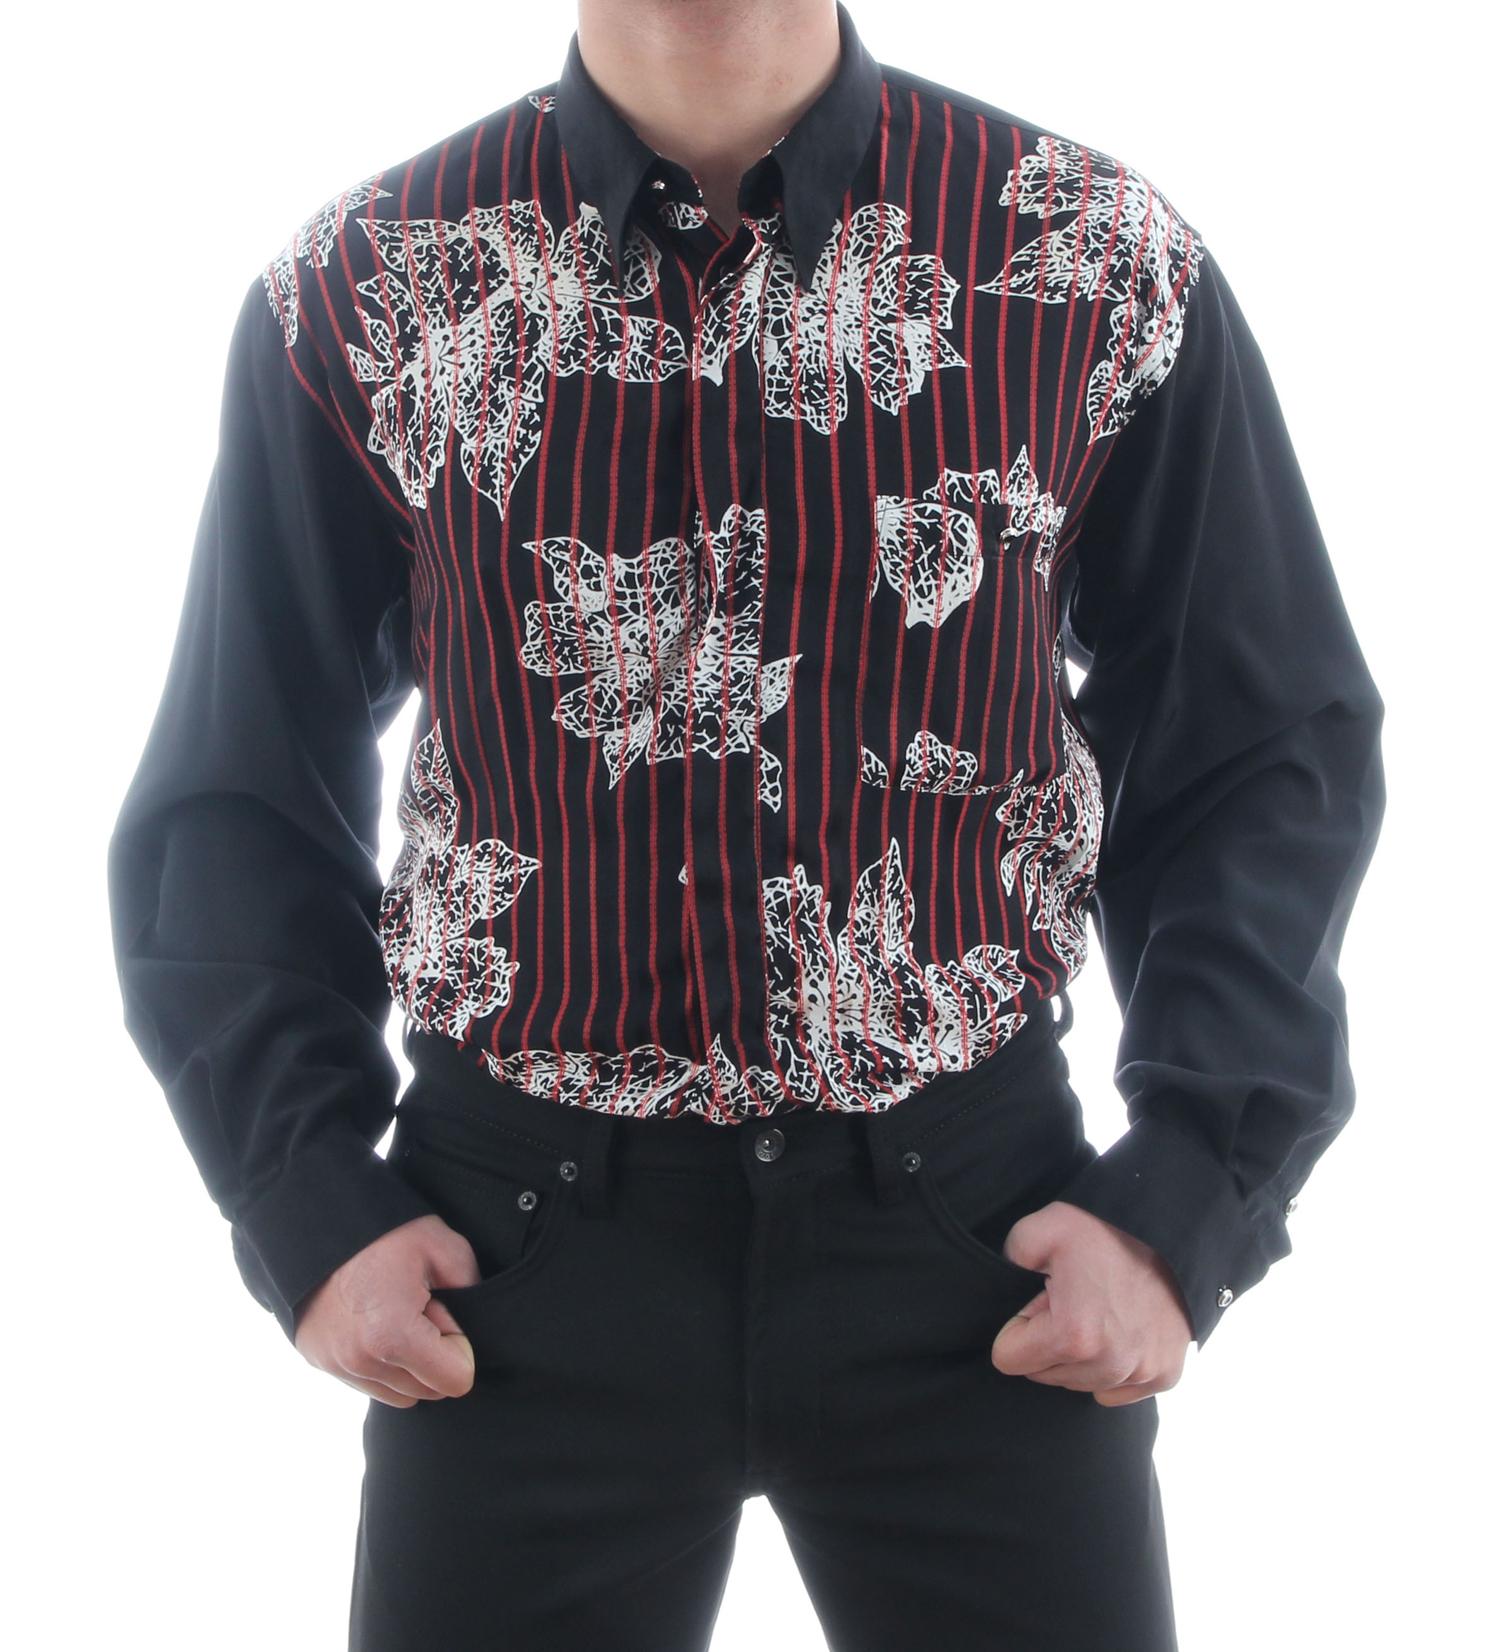 H K Mandel Kreative Mode Fur Manner Luxus Designerhemden